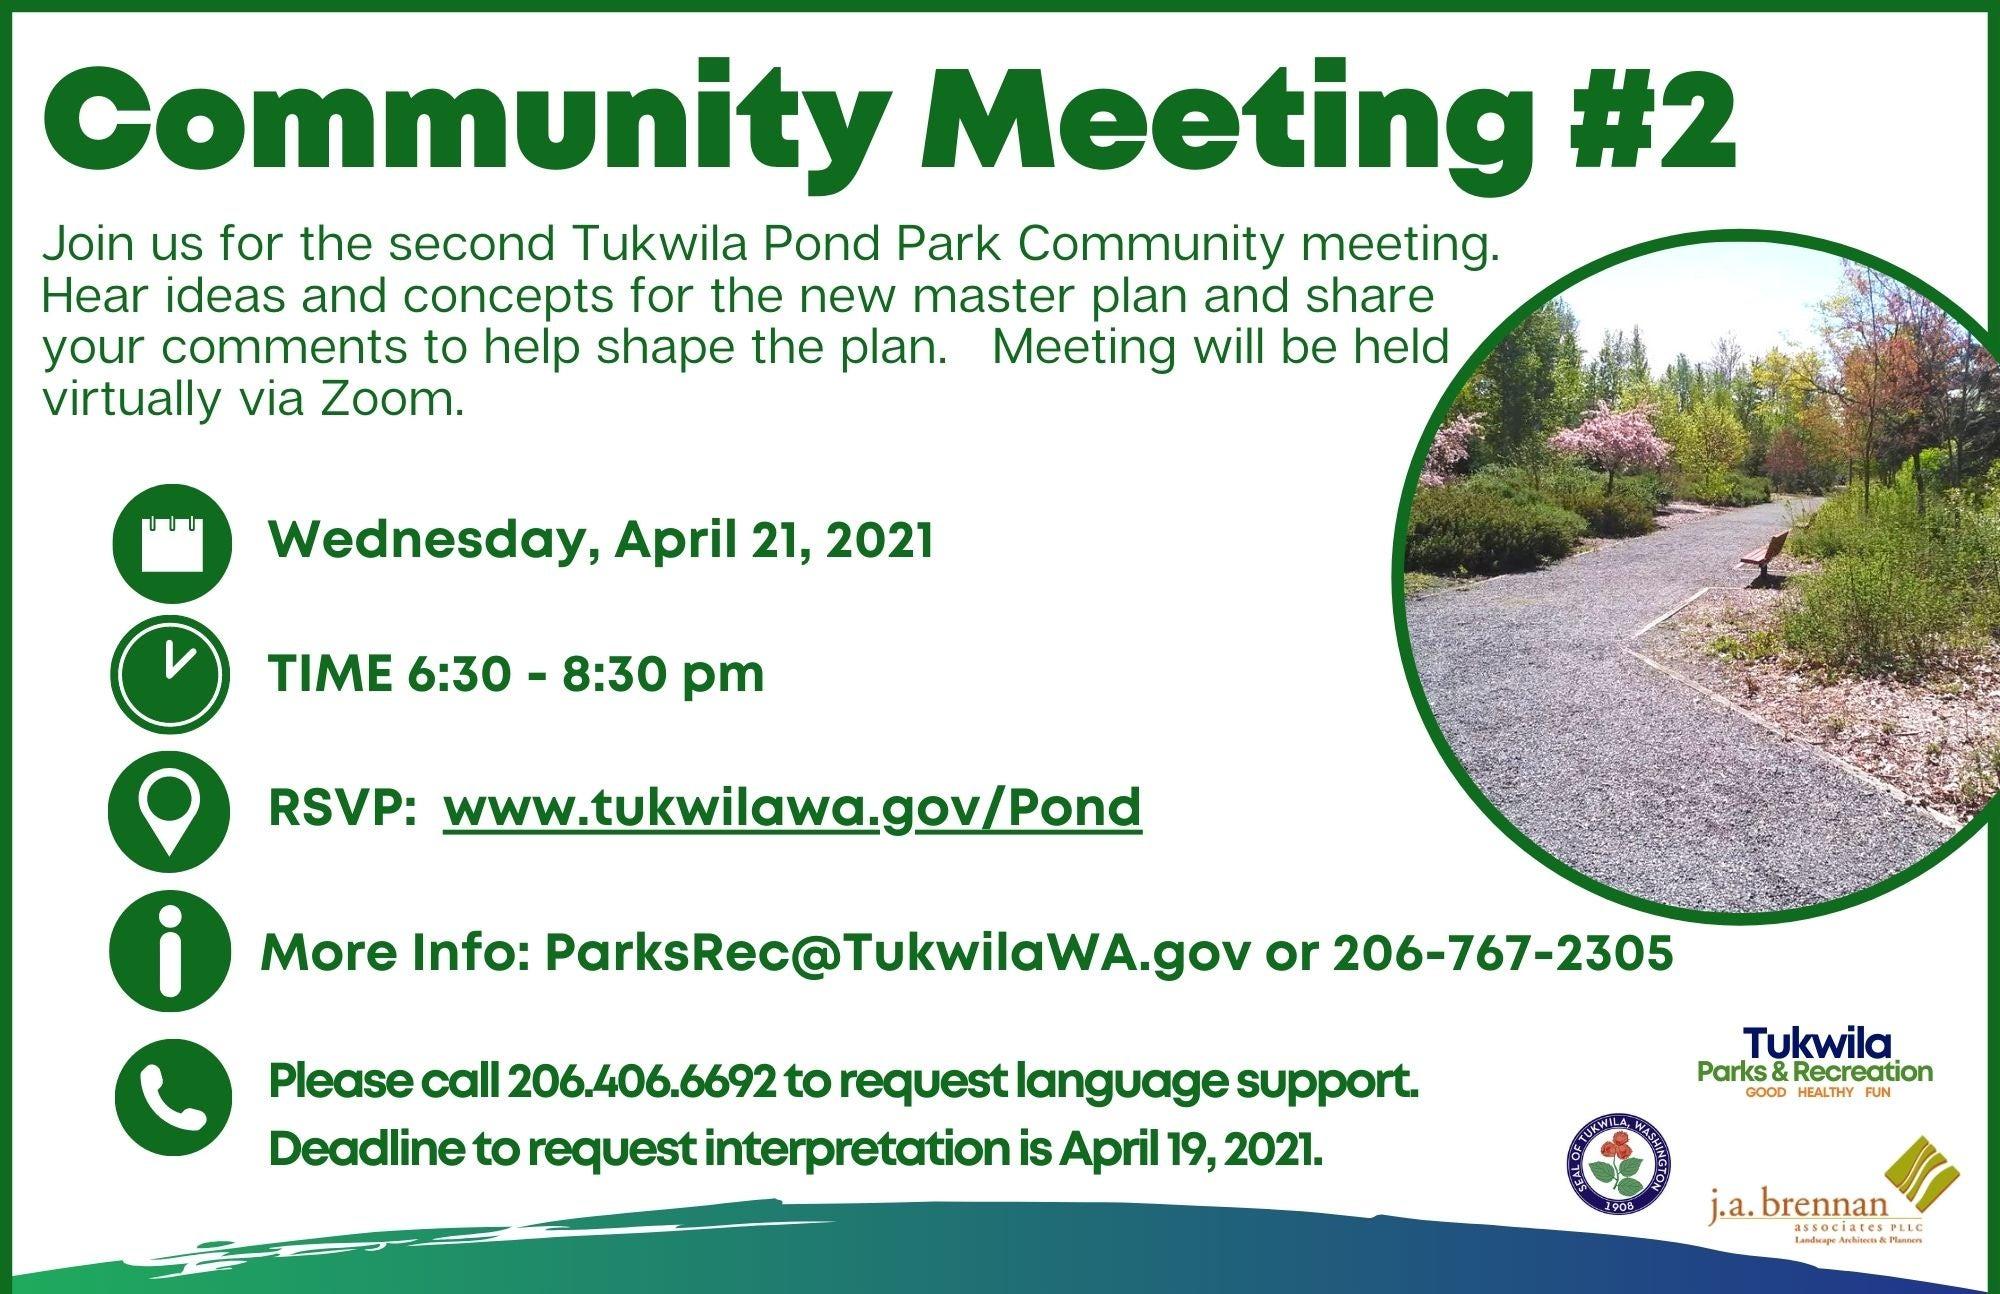 Tukwila Pond Master Plan Community Meeting #2